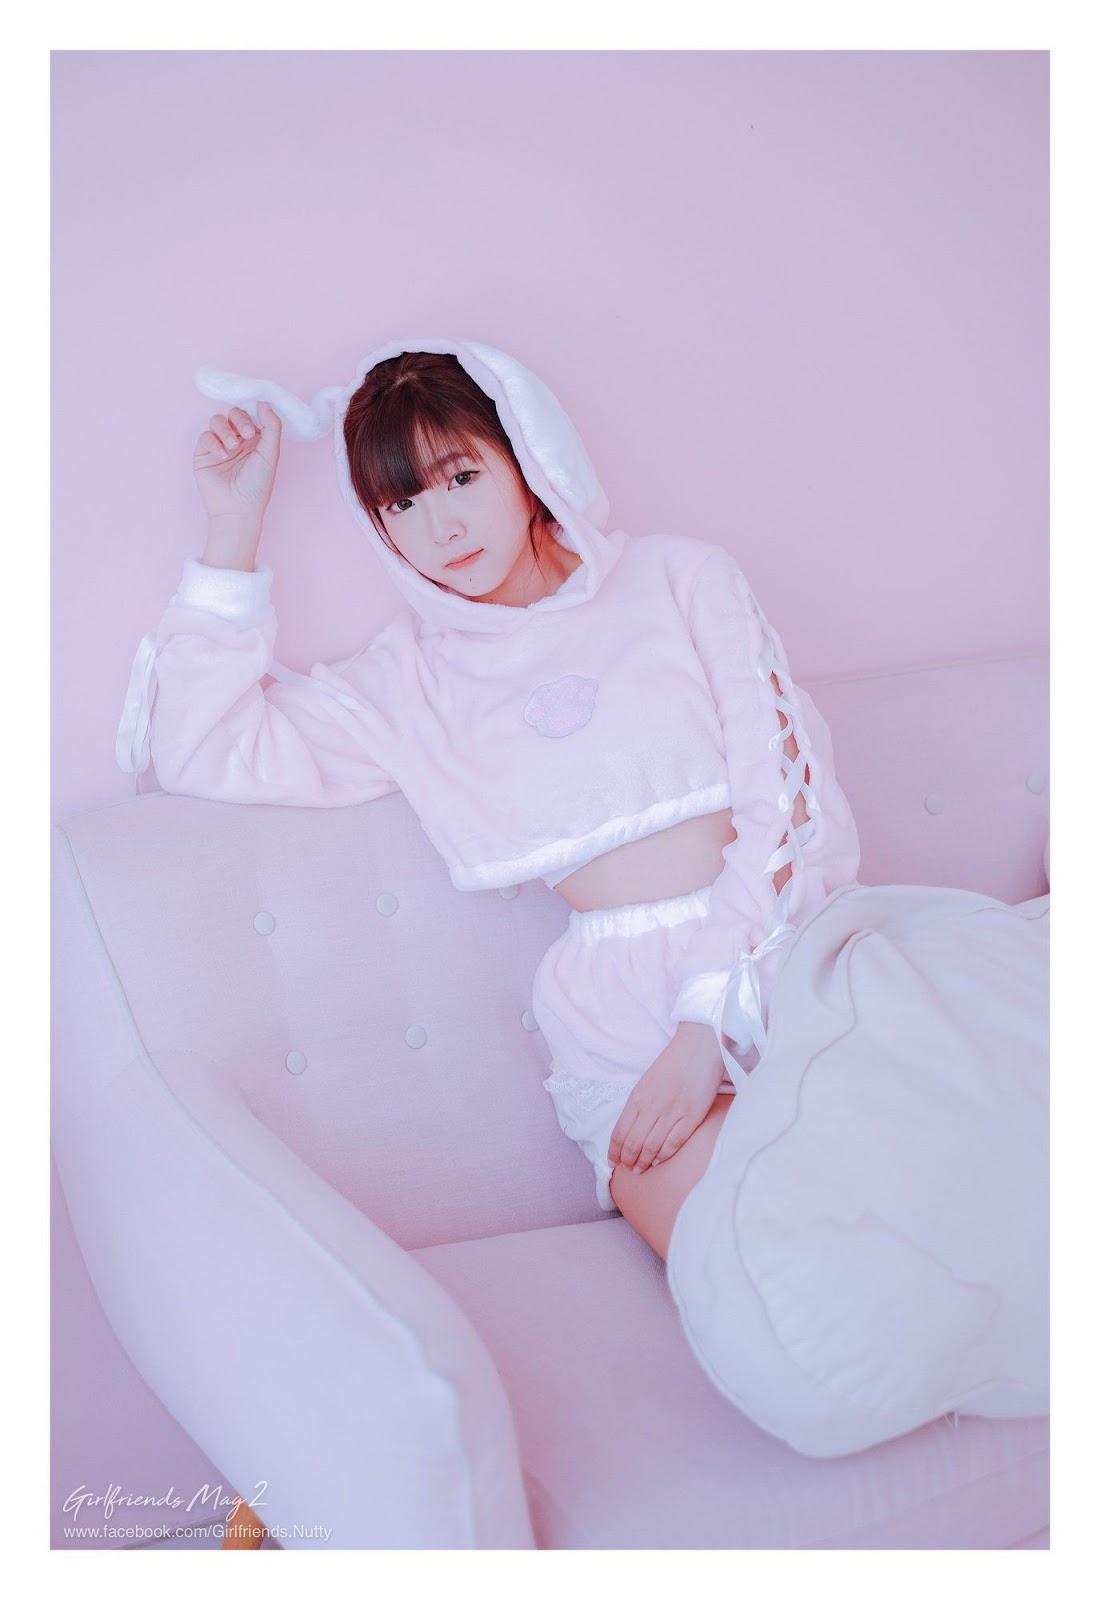 Image Thailand Model - Pakkhagee Arkornpattanakul - Pink Bunny - TruePic.net - Picture-1